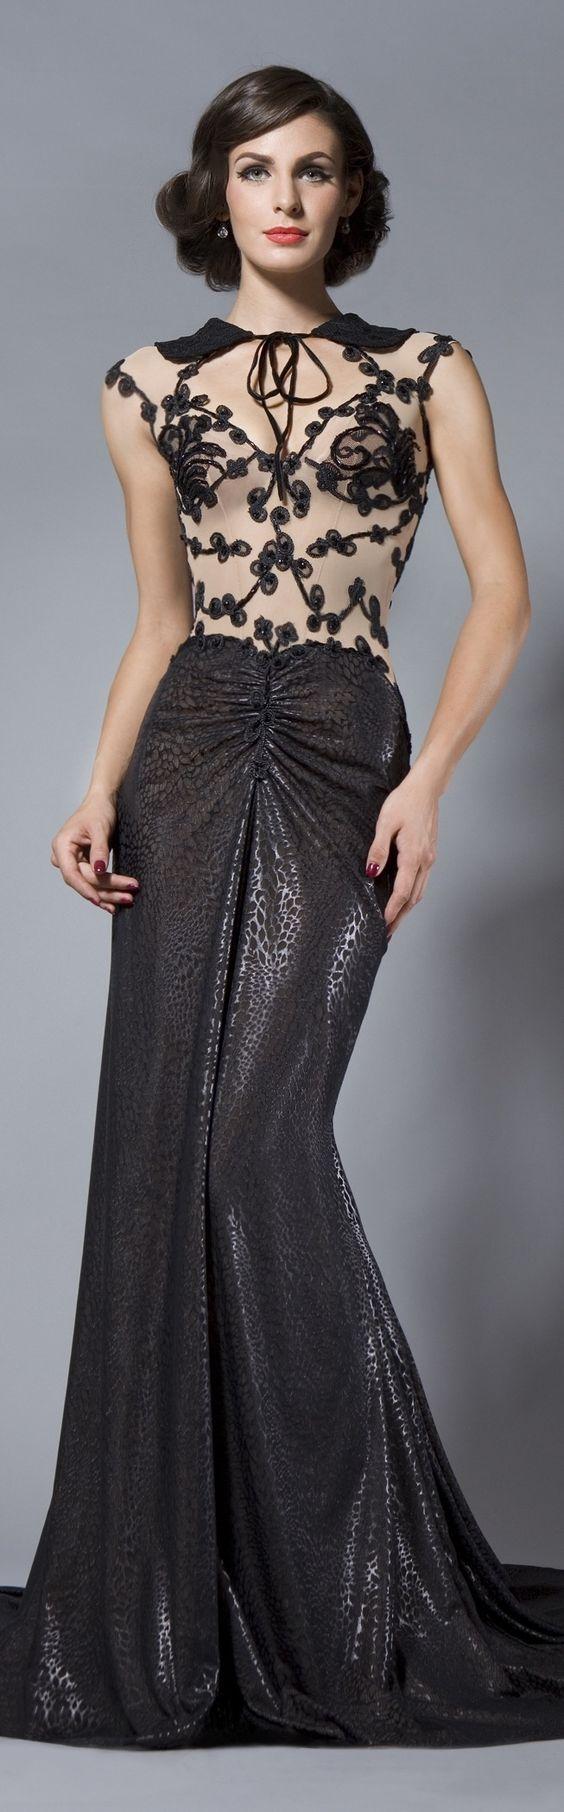 Rochii de Seara - Colectia Velvet Angels: Dresses 2Dayslook, Colectia Velvet, Style Lacedresses, Angels 2013, Seara Velvet, Dresses For Women, Clothing Japancloth